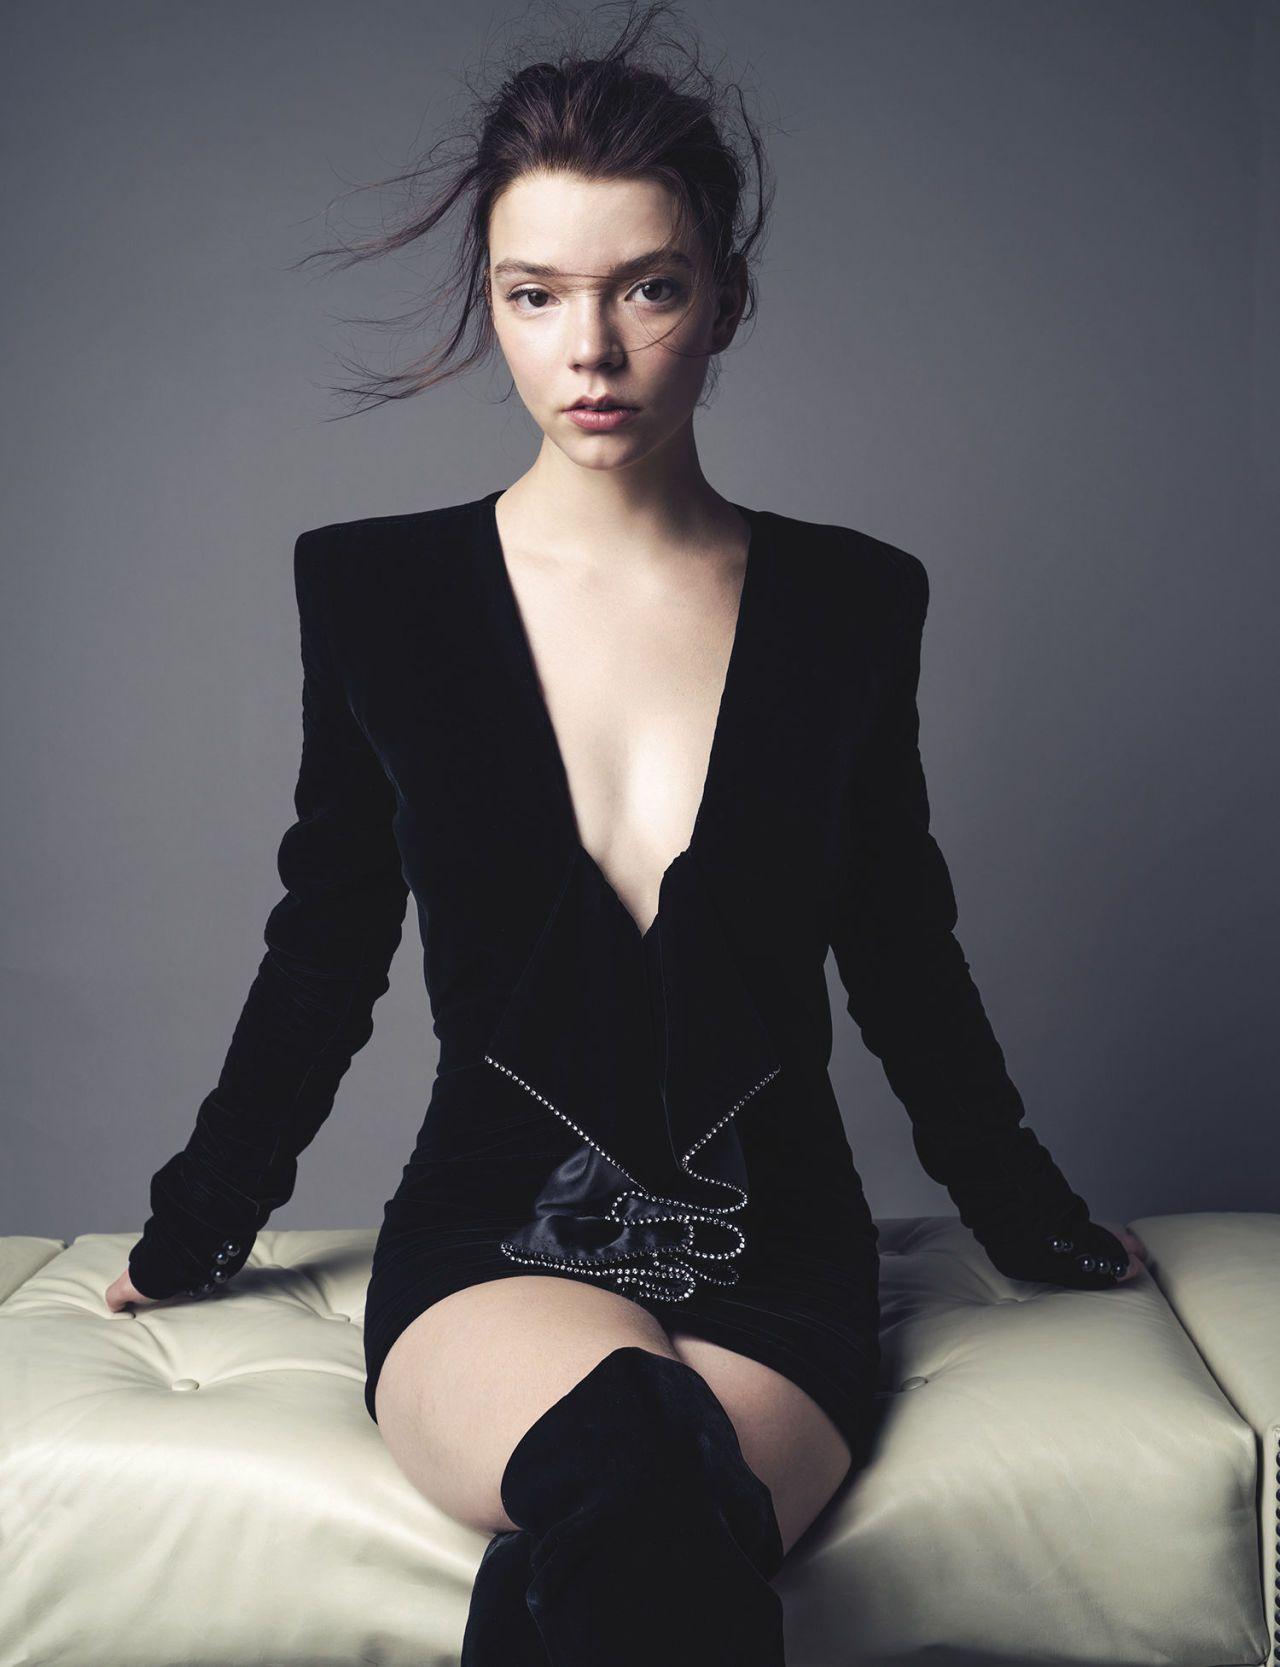 Anya Taylor-Joy sexy lingerie pics